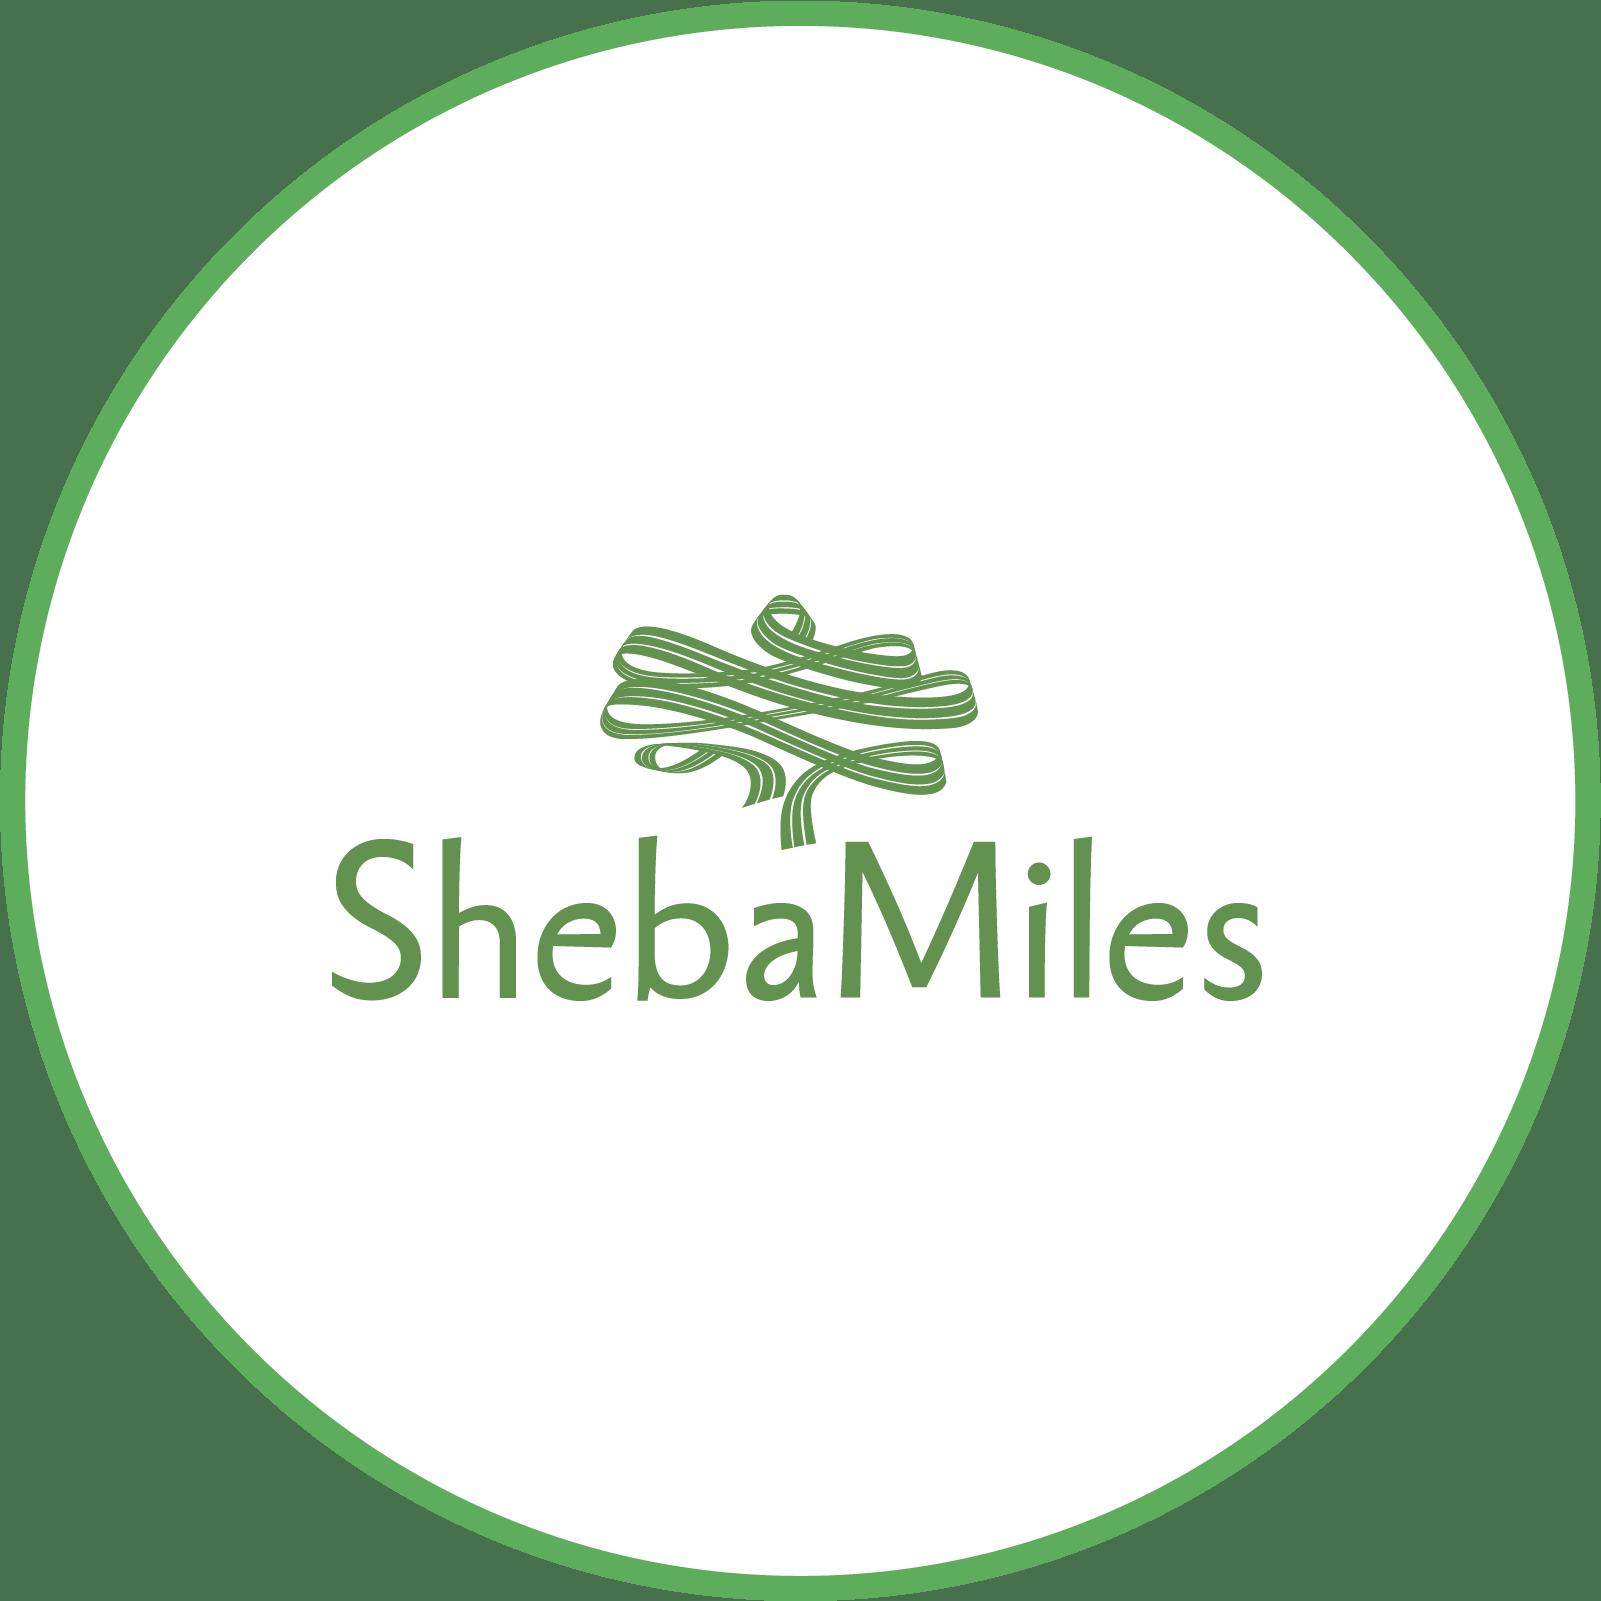 Shebamiles deals and offer